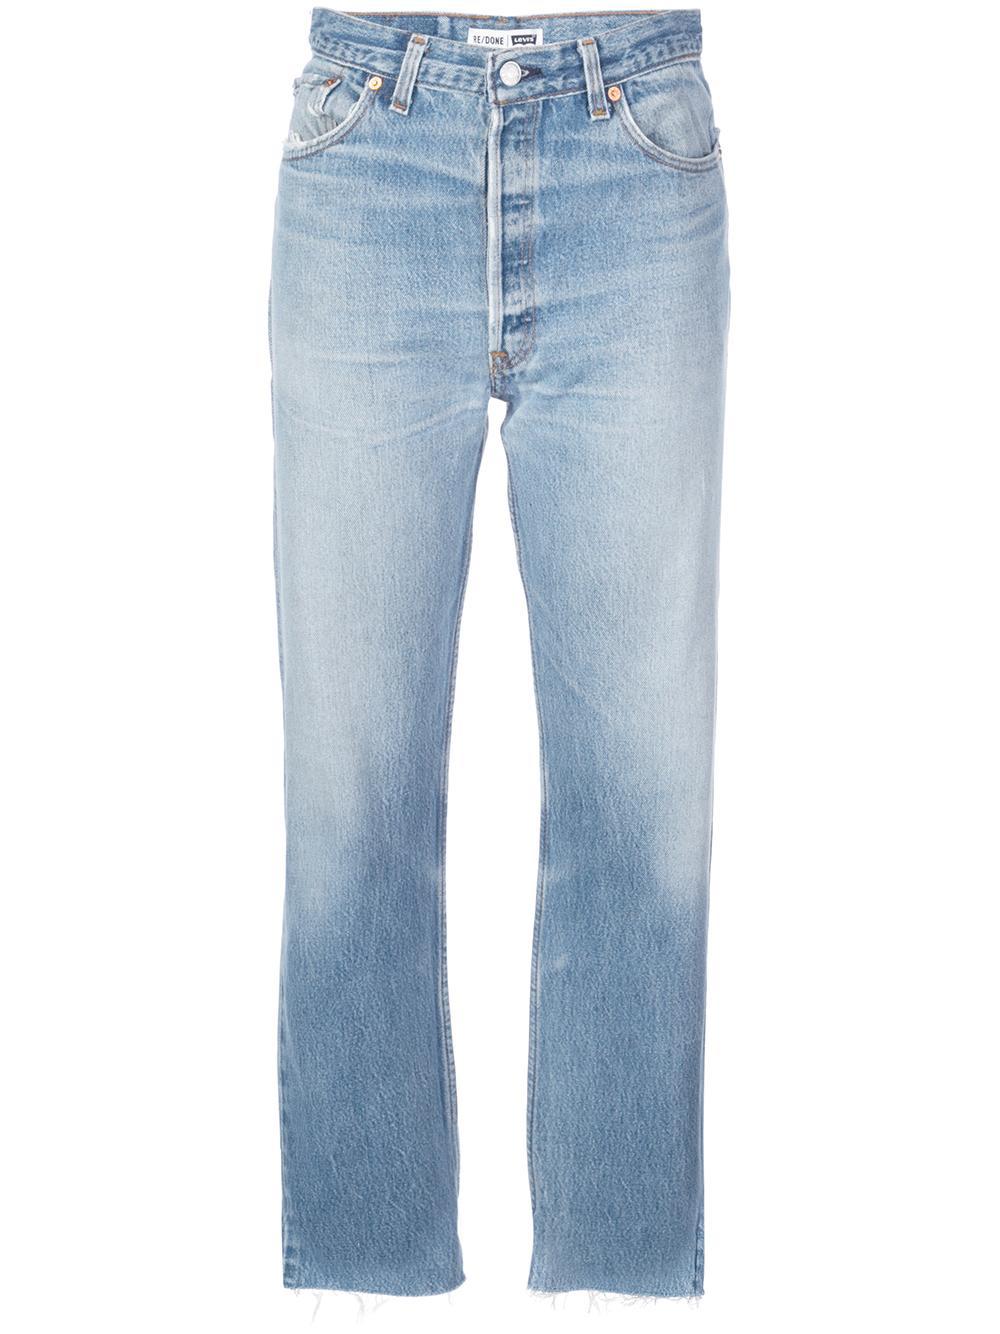 90s Loose Straight Jean